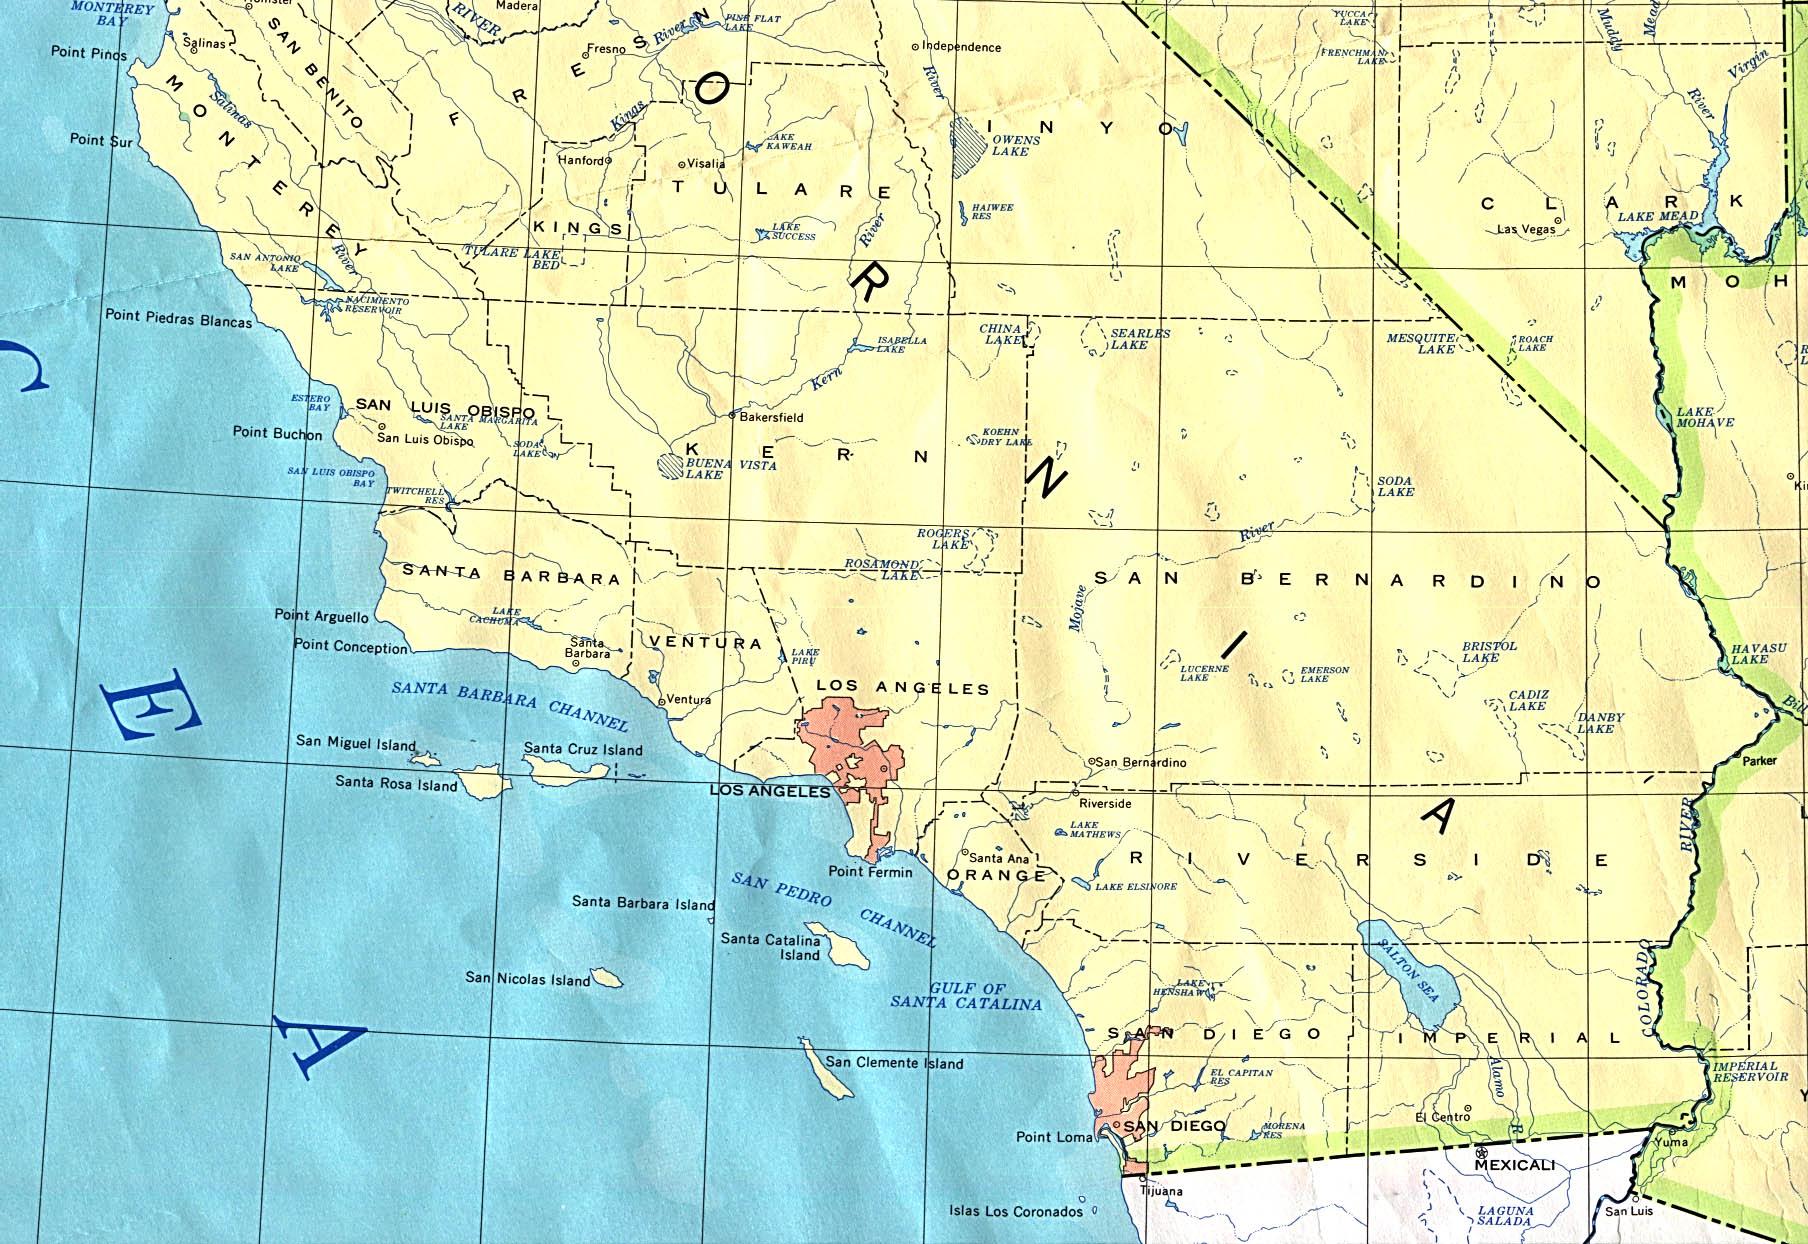 Southern California Base Map - California Atlas Map